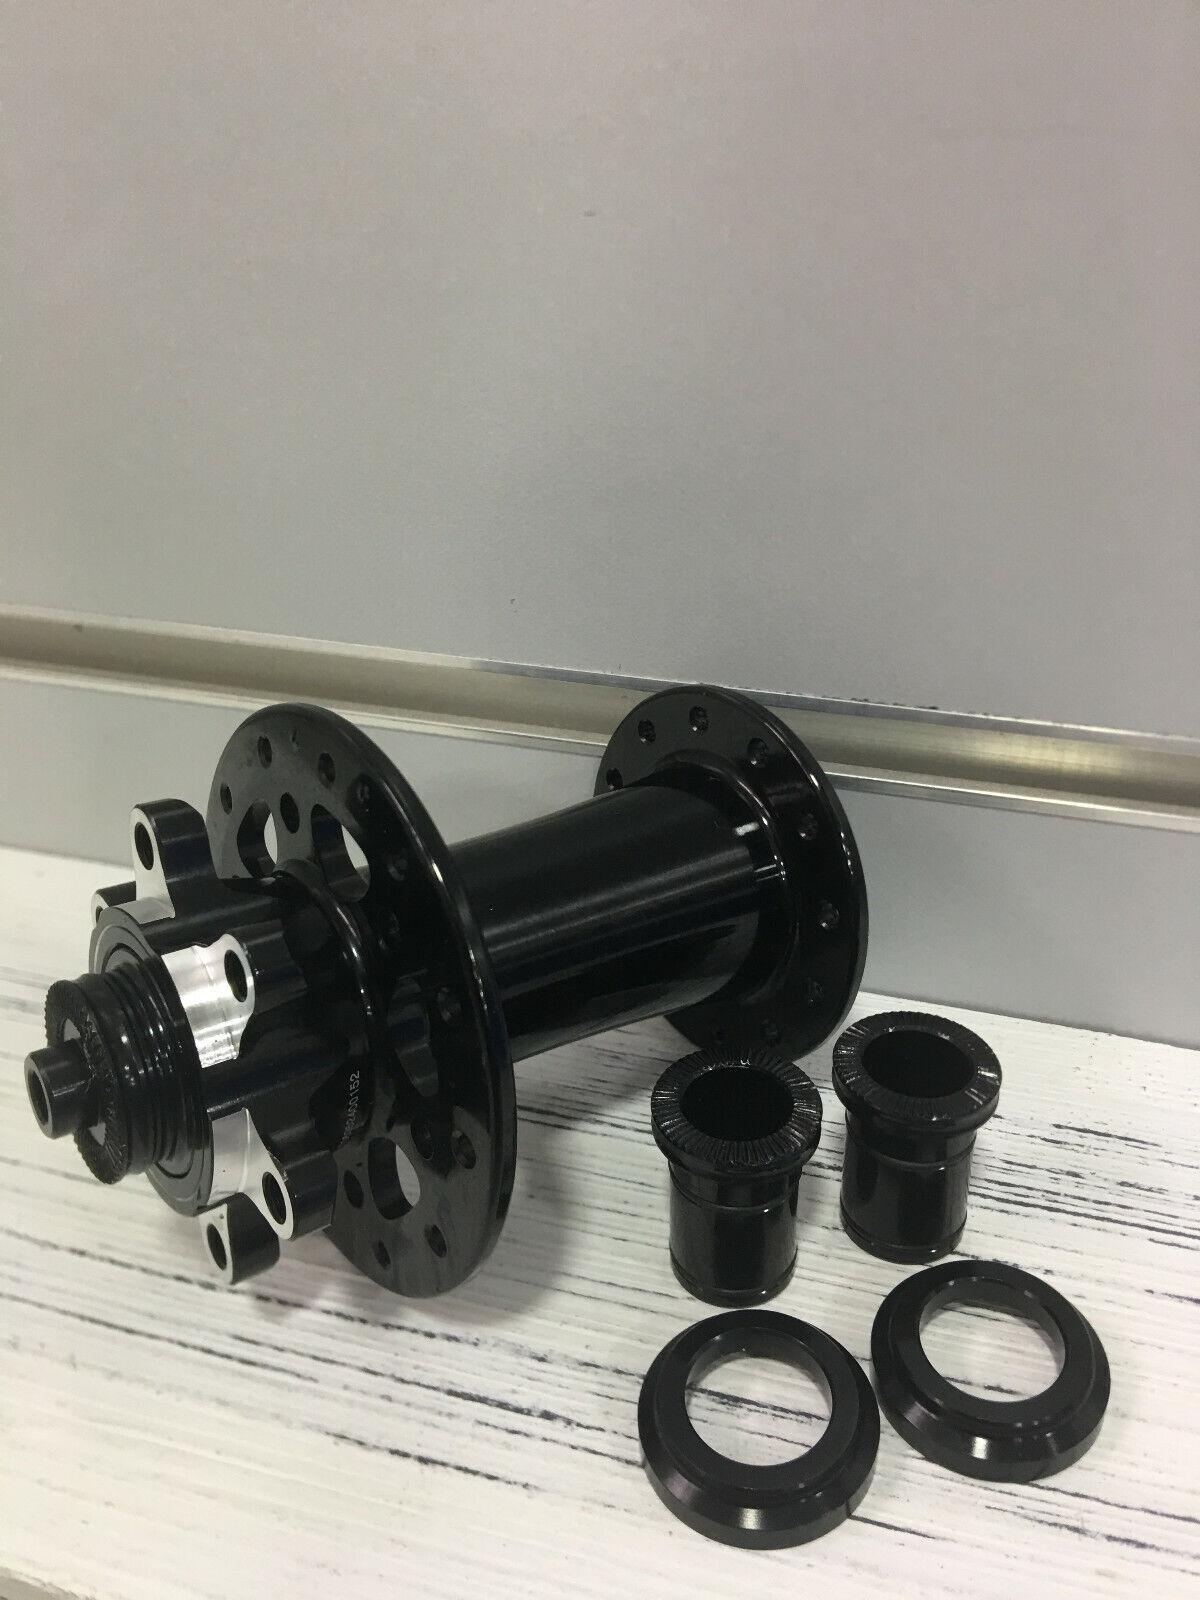 Novatec D791SB 100x9mm 6 Bolts 24H With 12x15mm  Adaptor Disc Front Hub  discount